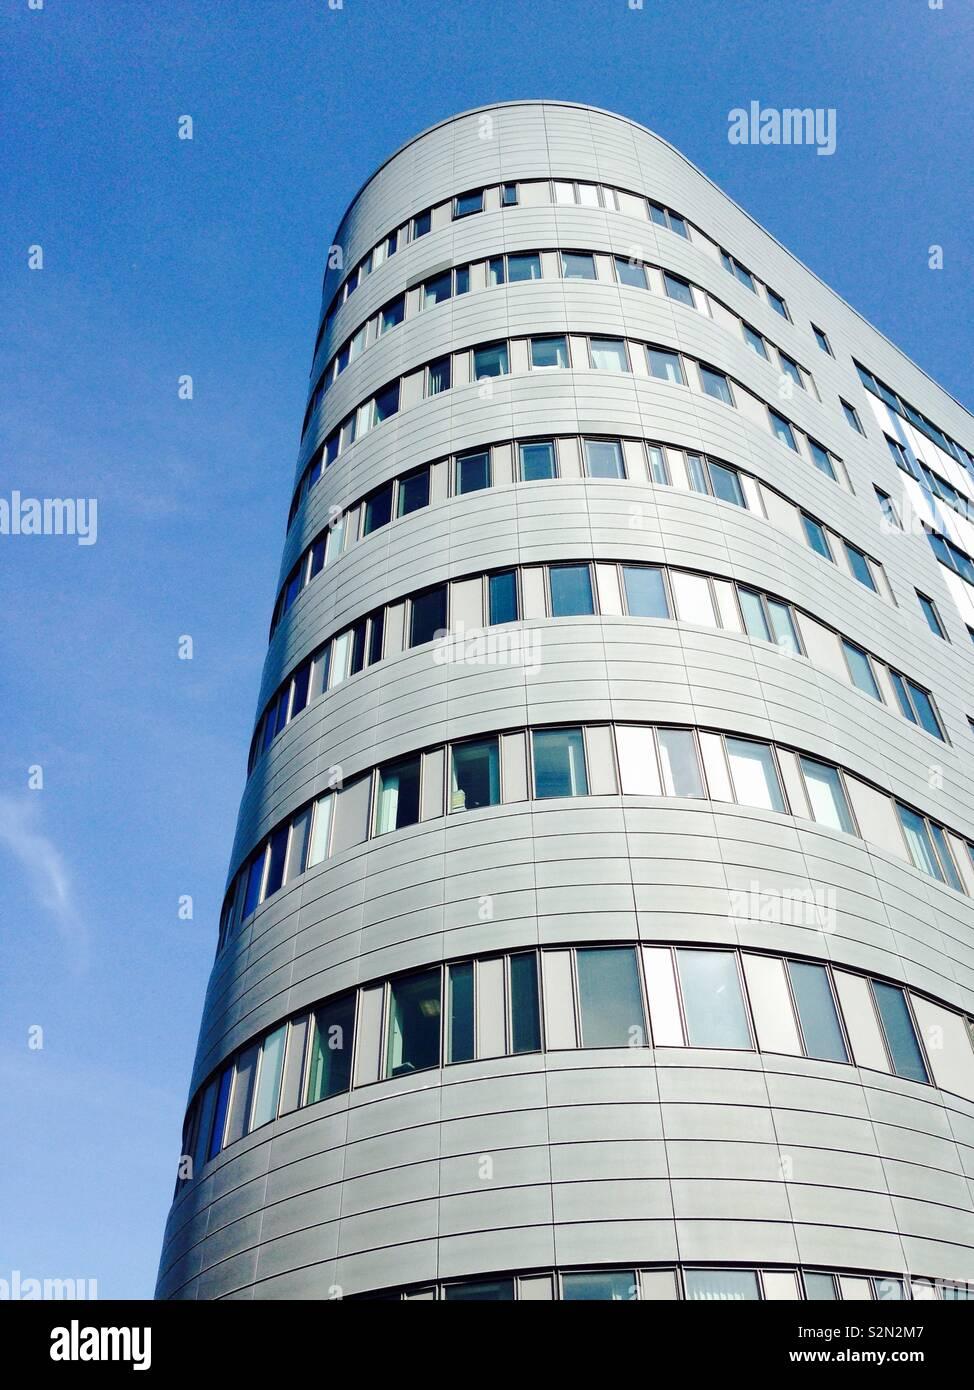 Bexley Wing St James Hospital Leeds - Stock Image